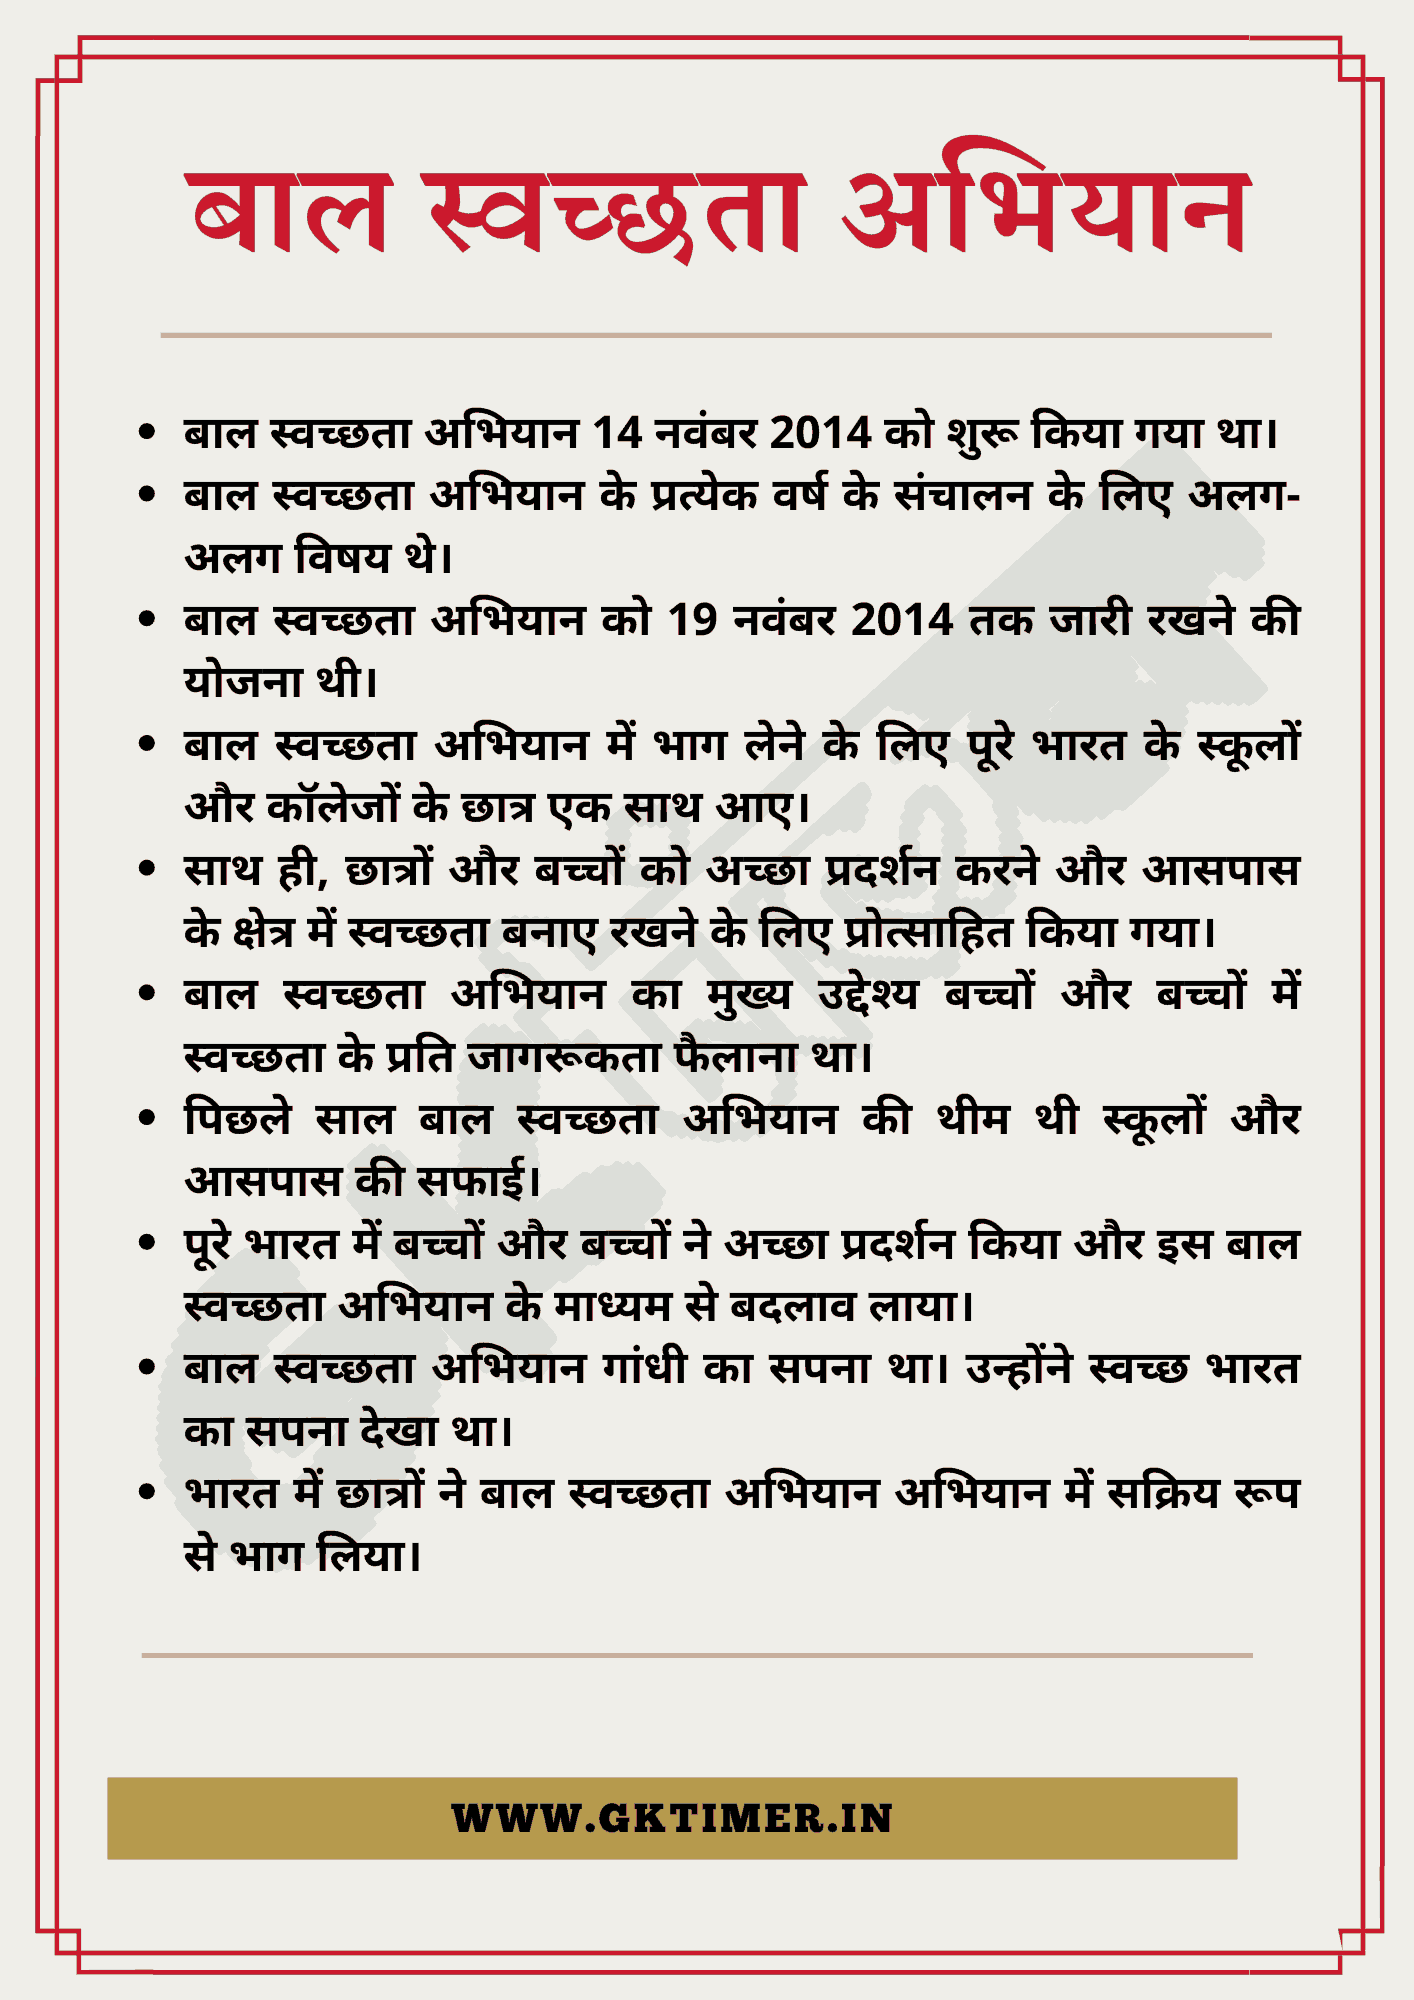 बाल स्वच्छता अभियान पर निबंध   Essay on Bal Swachhta Abhiyan in Hindi   10 Lines on Bal Swachhta Abhiyan in Hindi